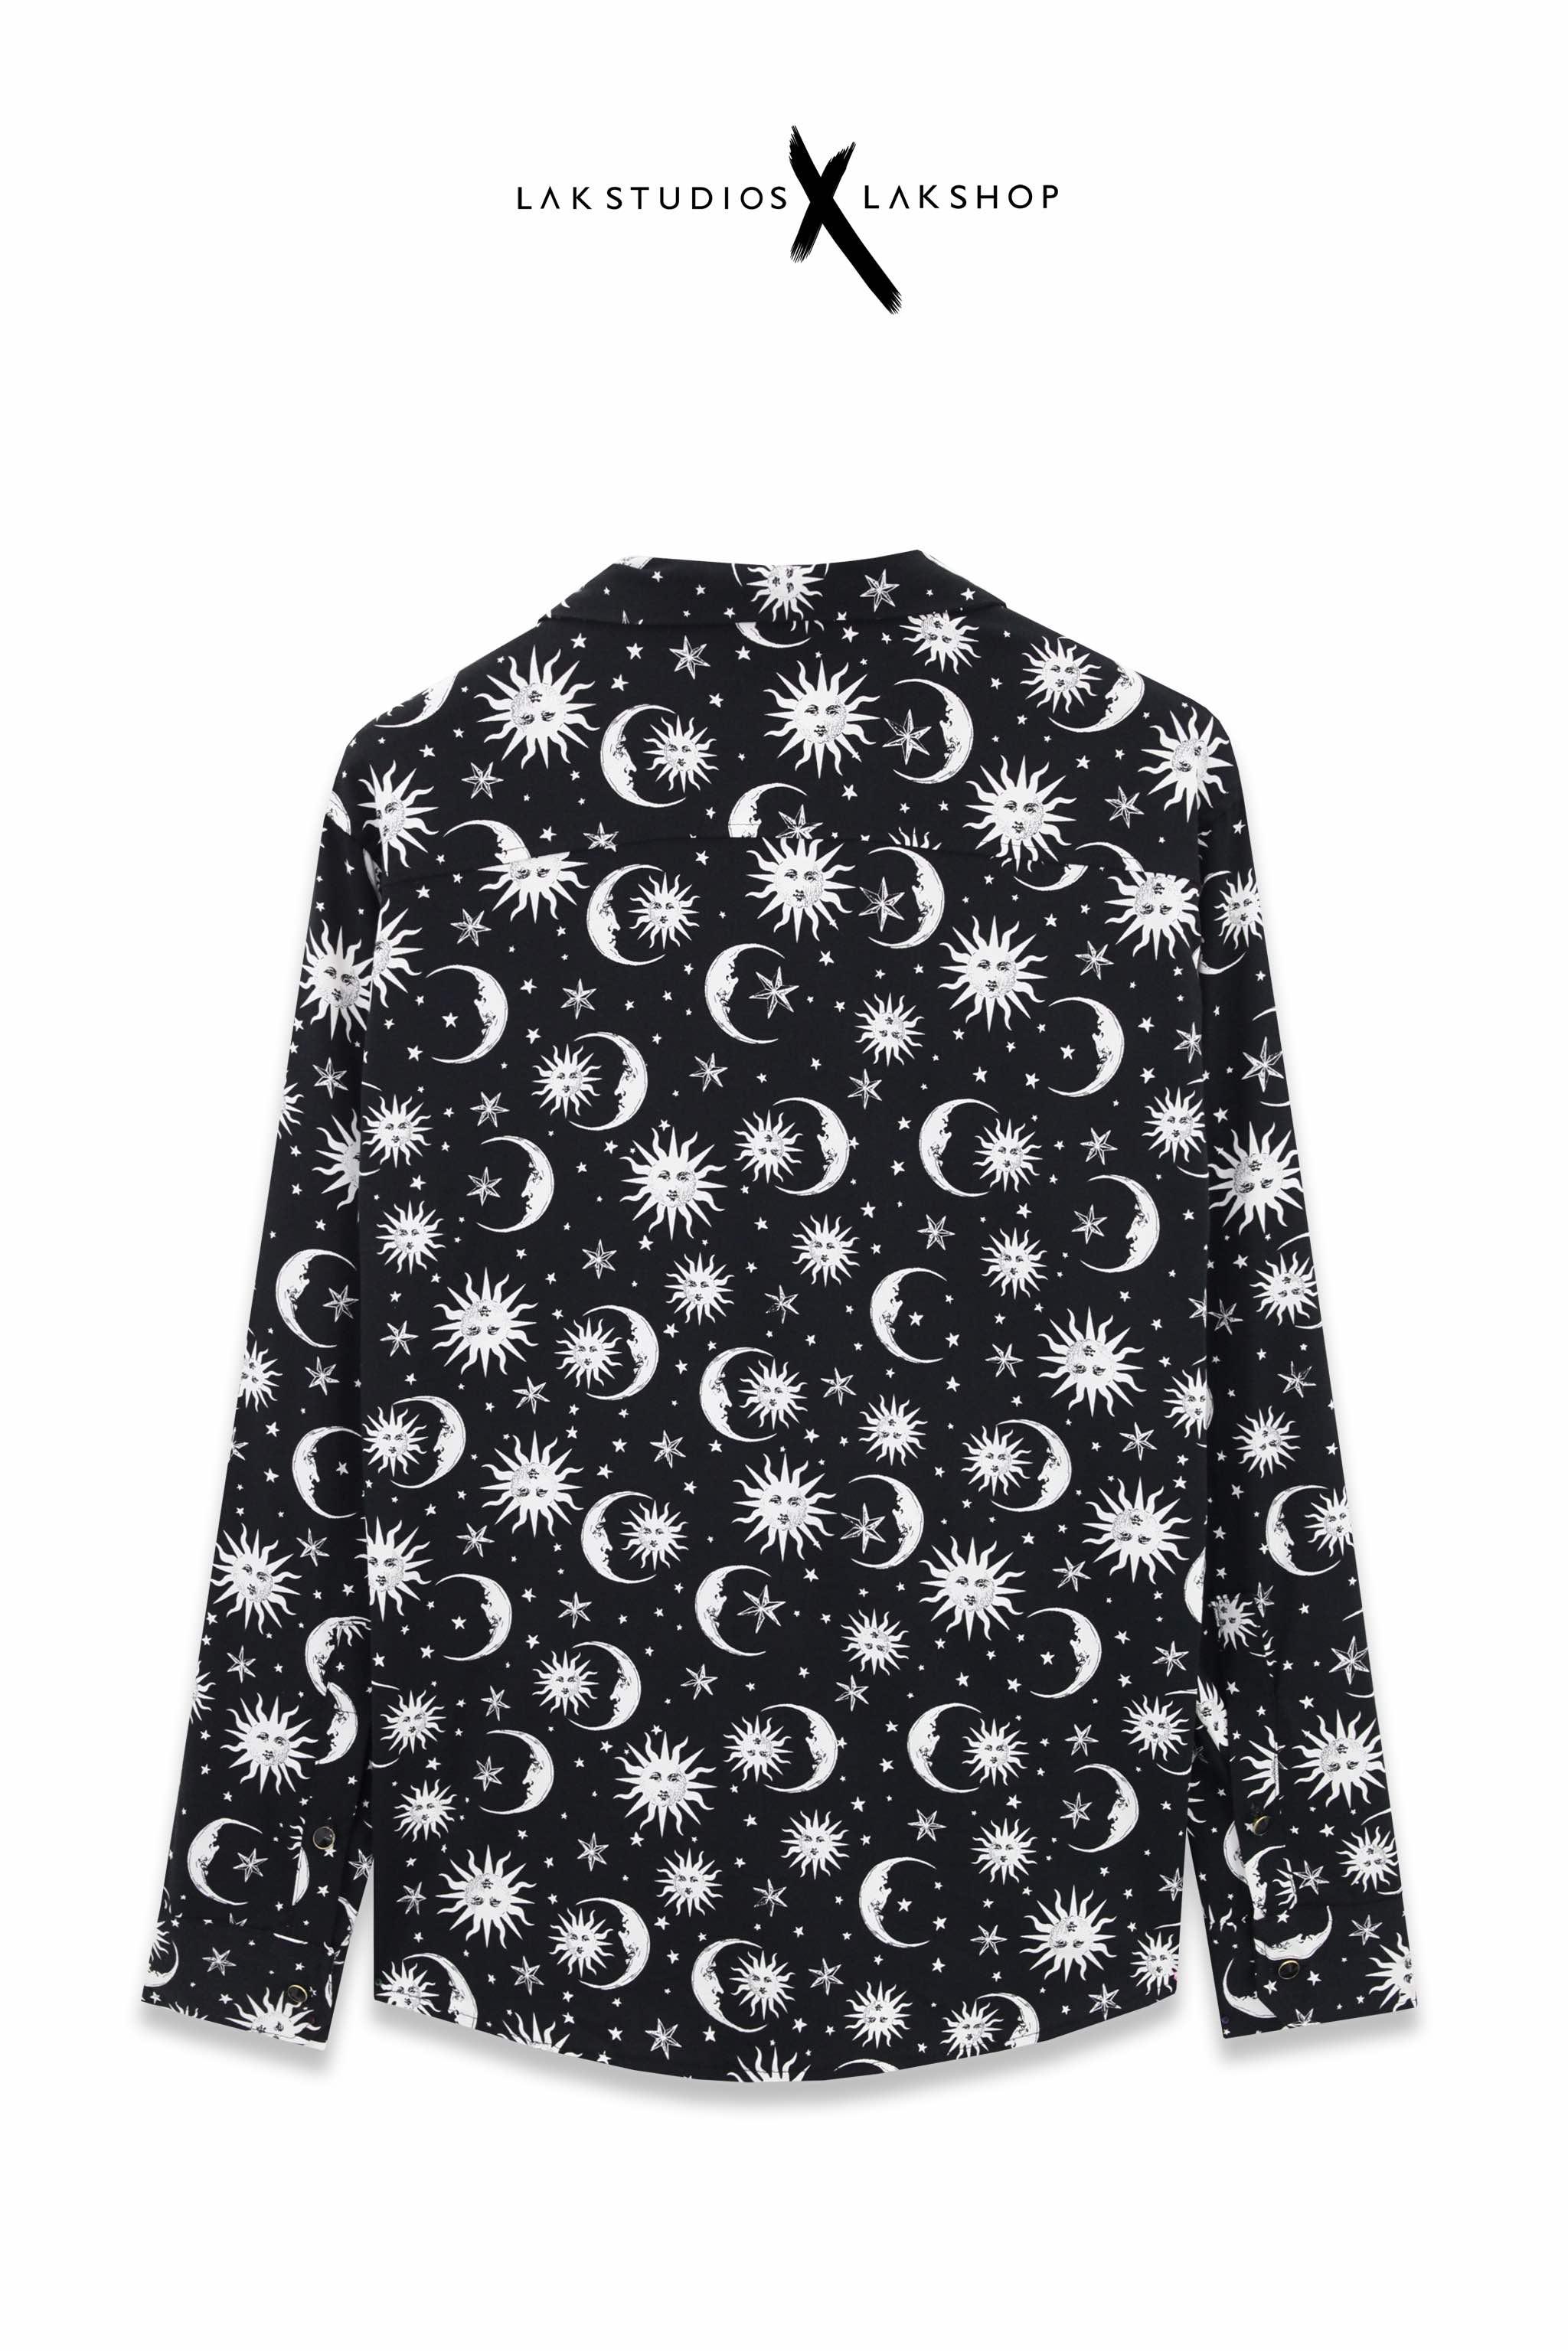 Oversized Graffiti Pocket Double Mesh Shirt ( vải lưới 5 lớp )